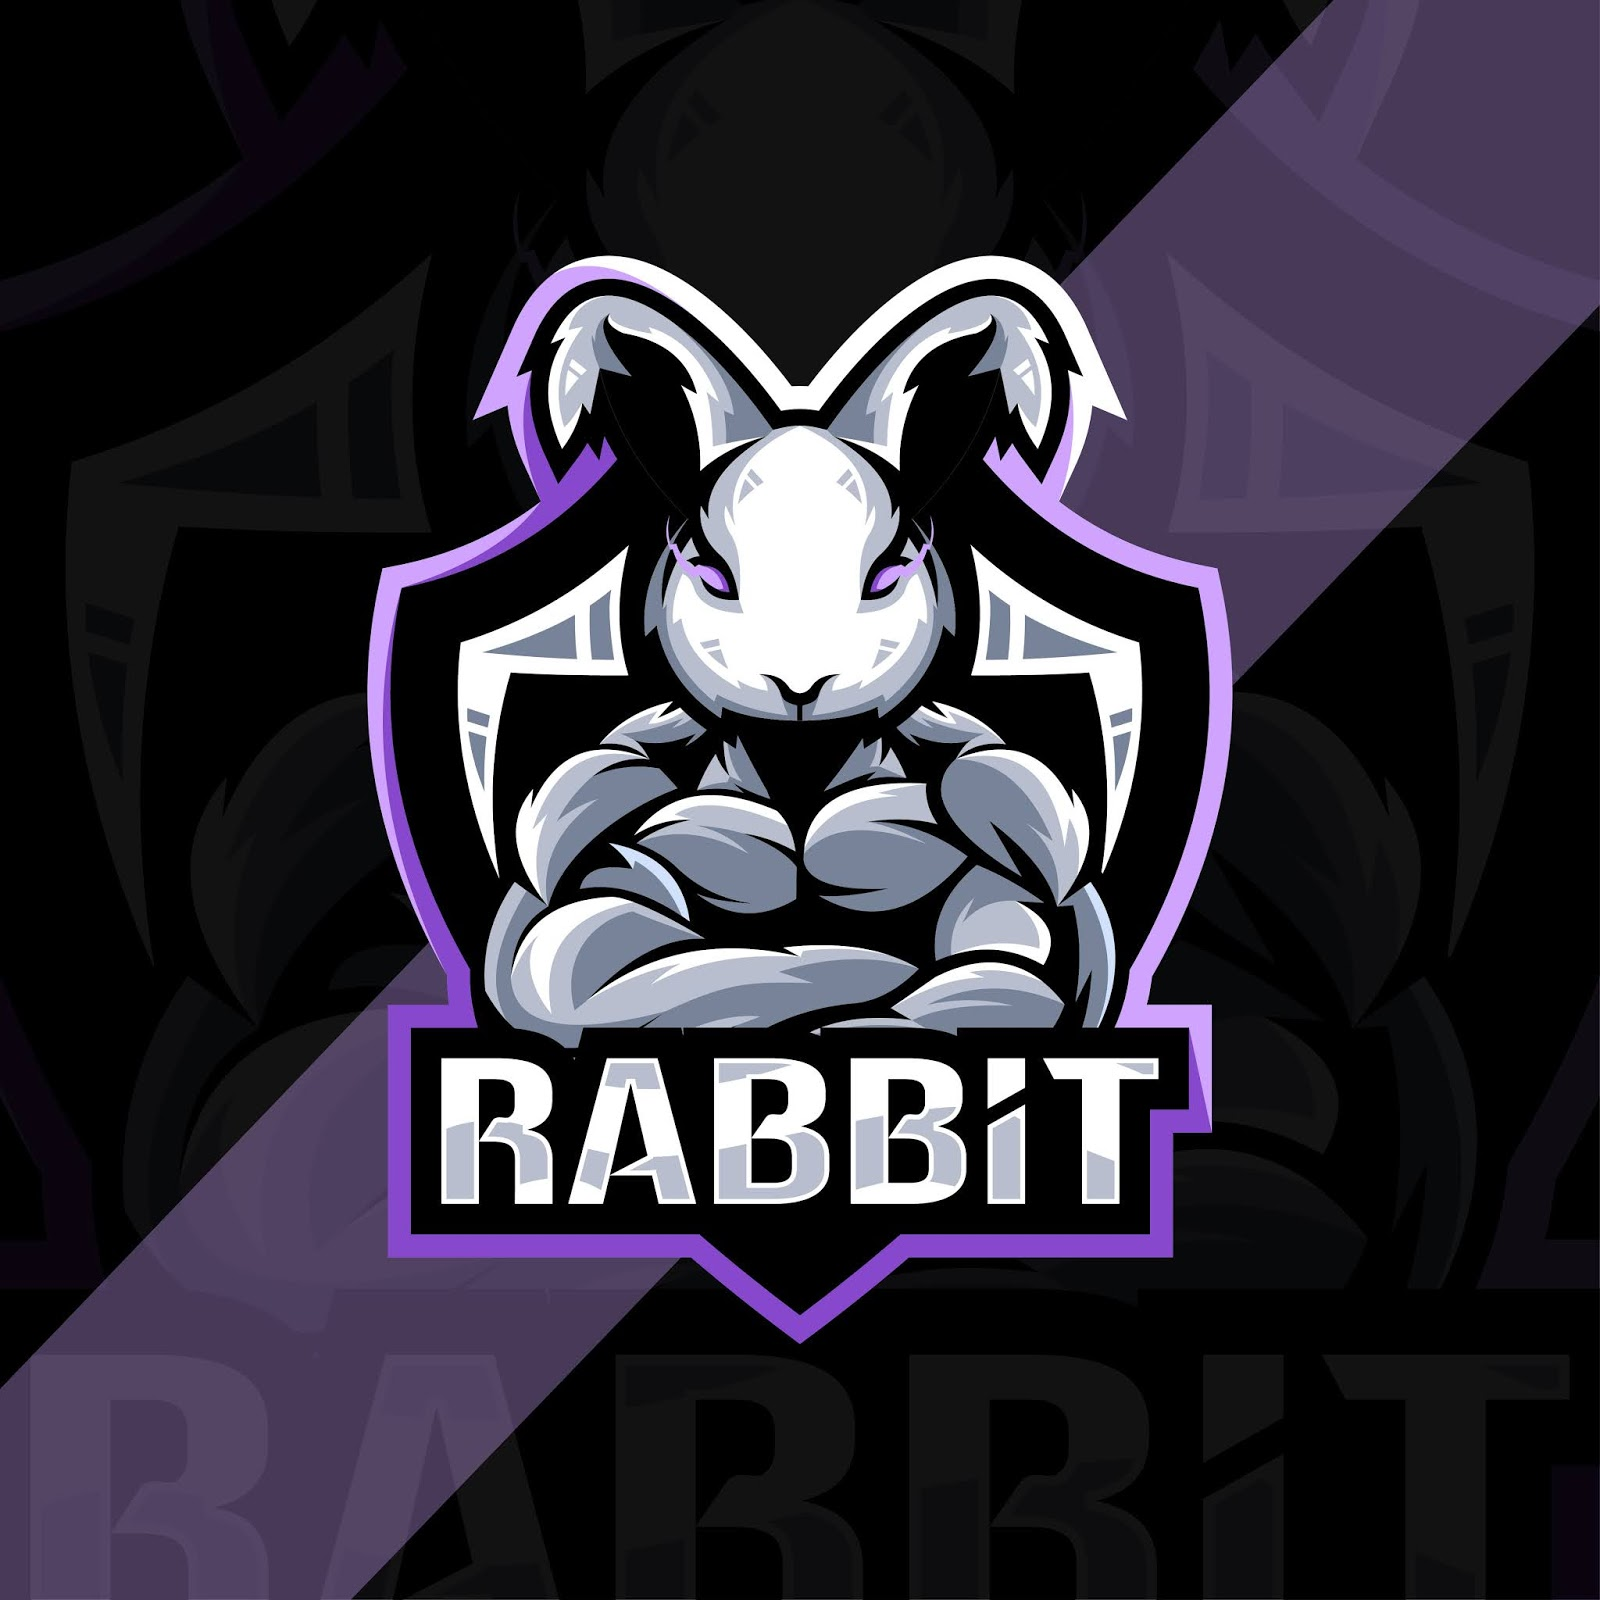 Rabbit Mascot Logo Esport Design Free Download Vector CDR, AI, EPS and PNG Formats